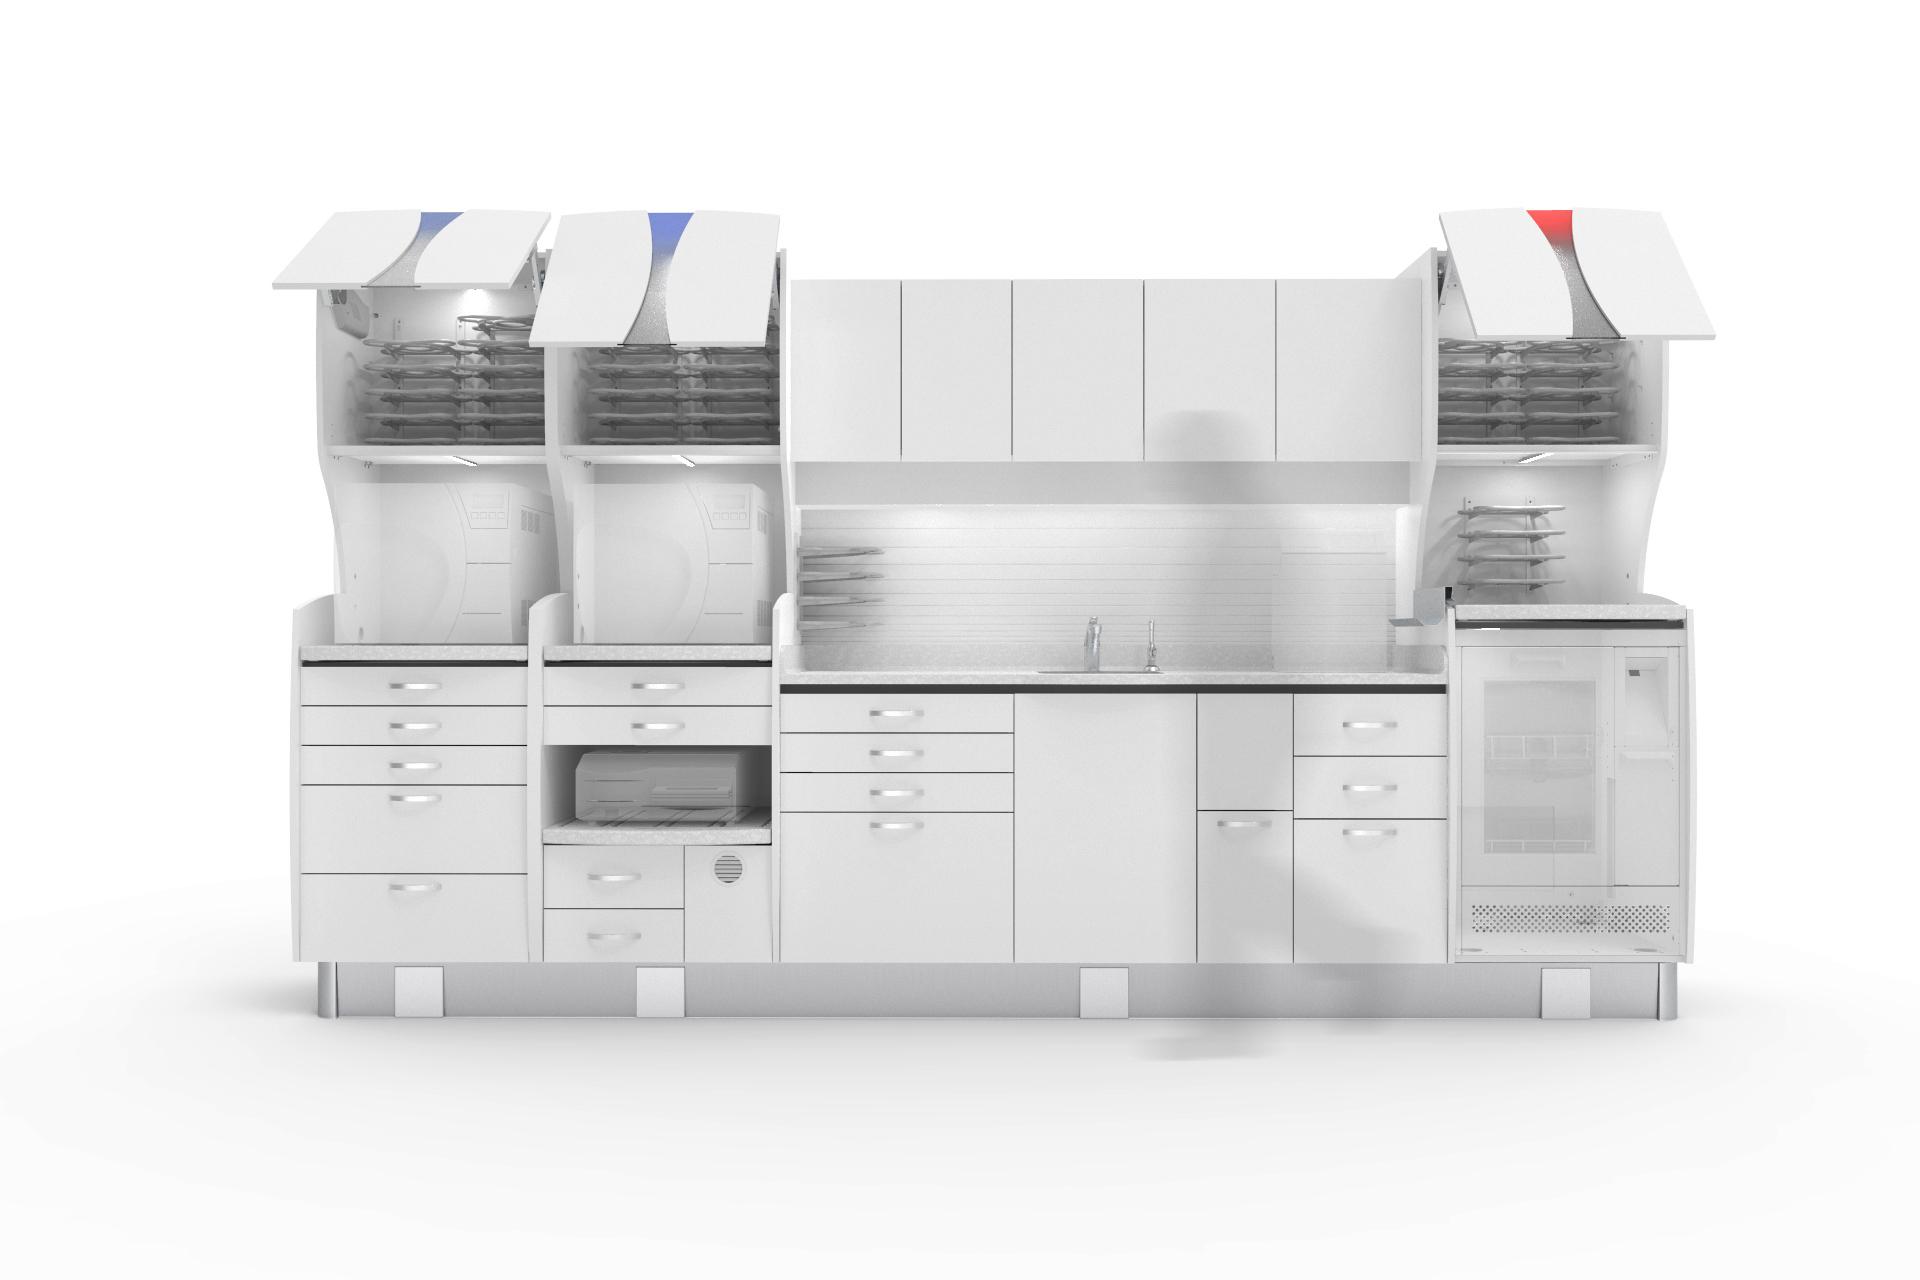 Sterilization & Instrument Processing